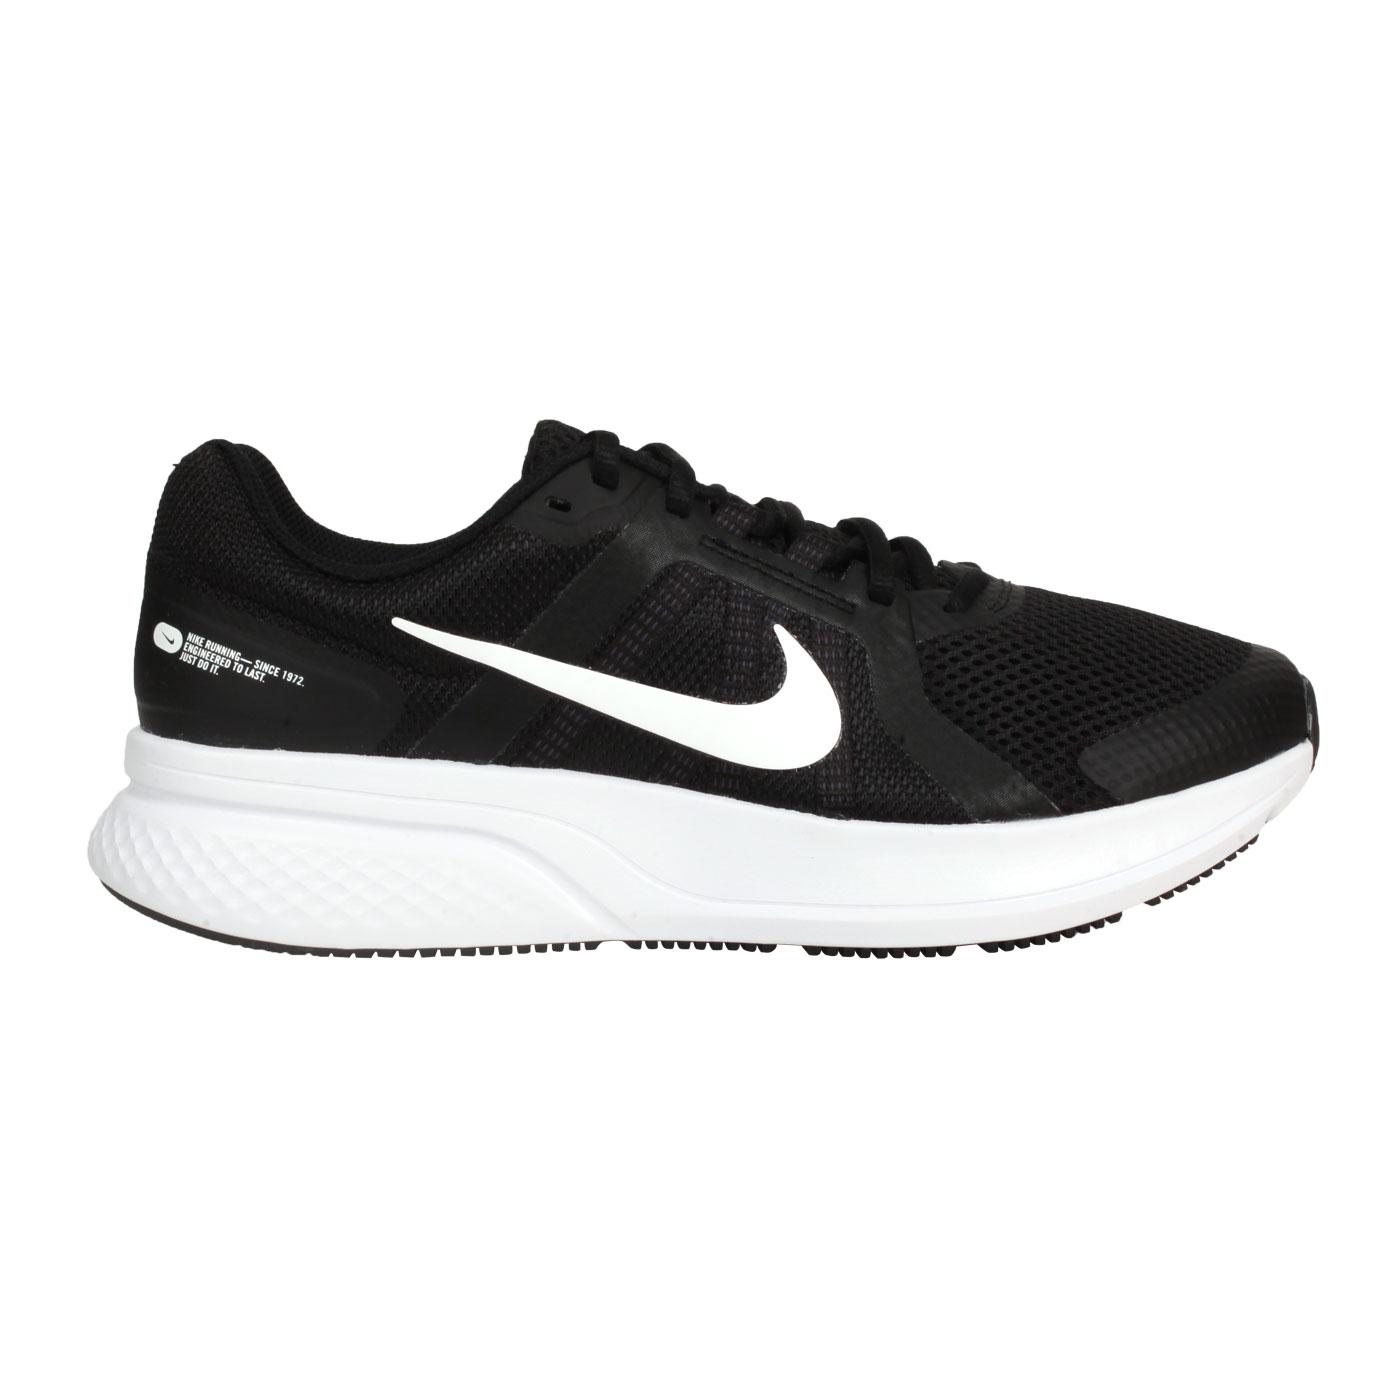 NIKE 男款慢跑鞋  @RUN SWIFT 2@CU3517004 - 黑白